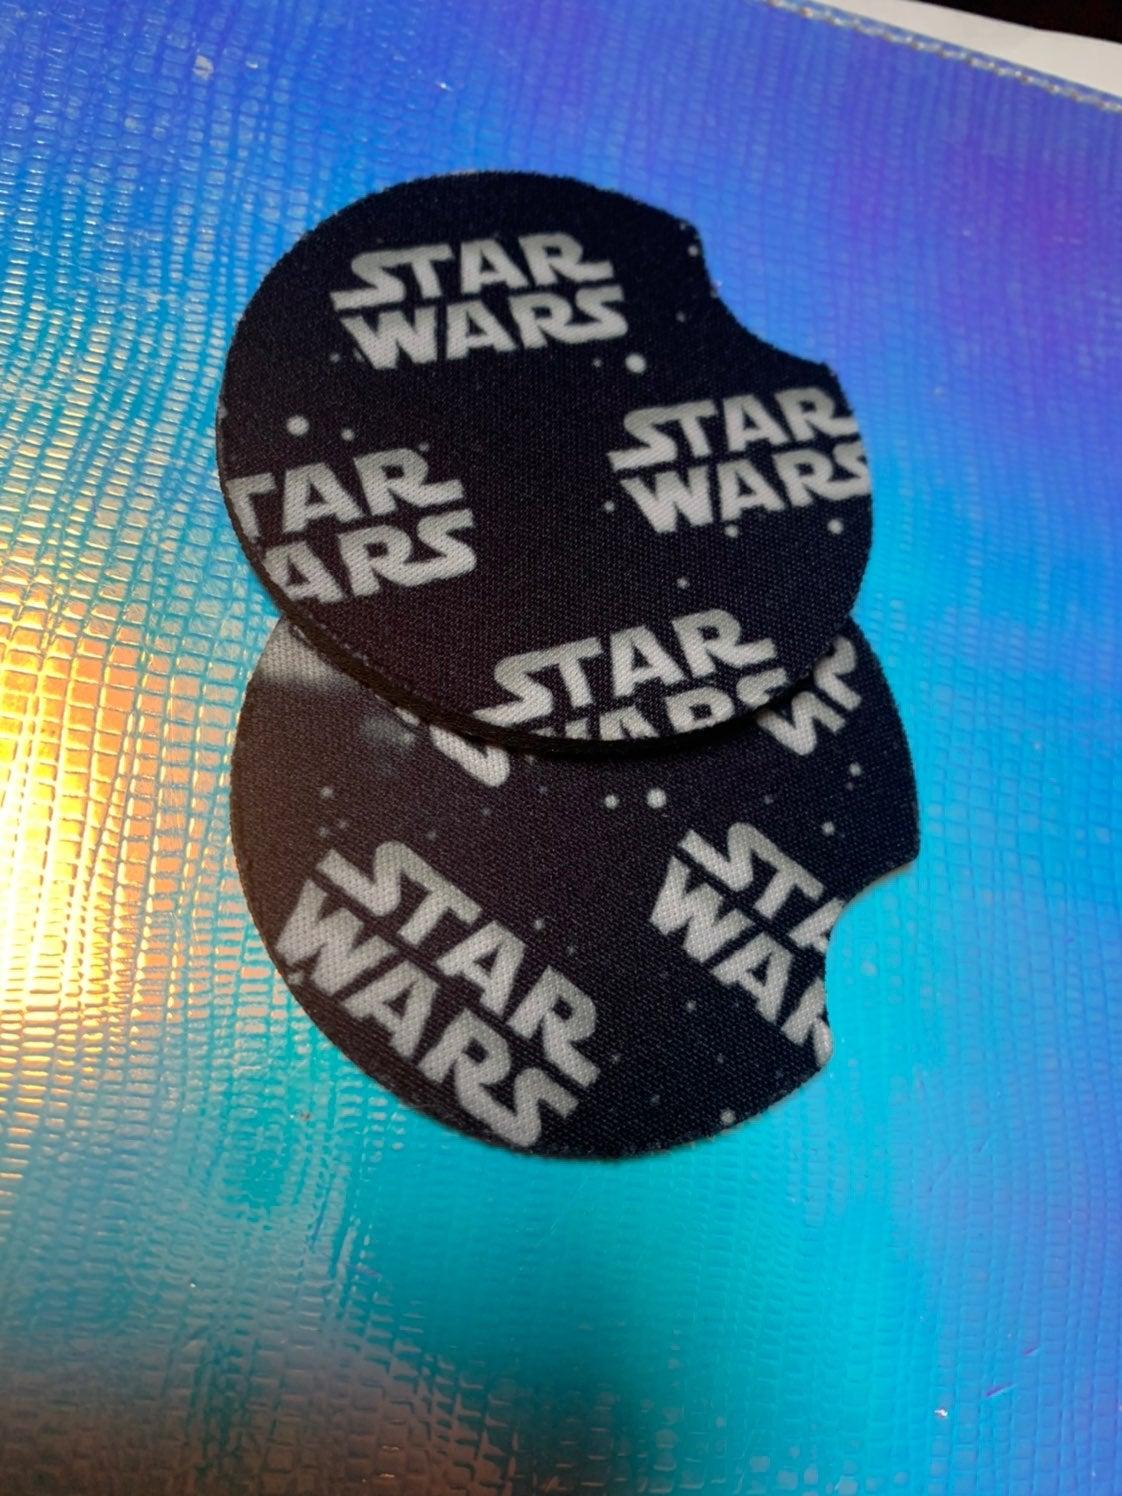 Star Wars Rubber Car Coasters